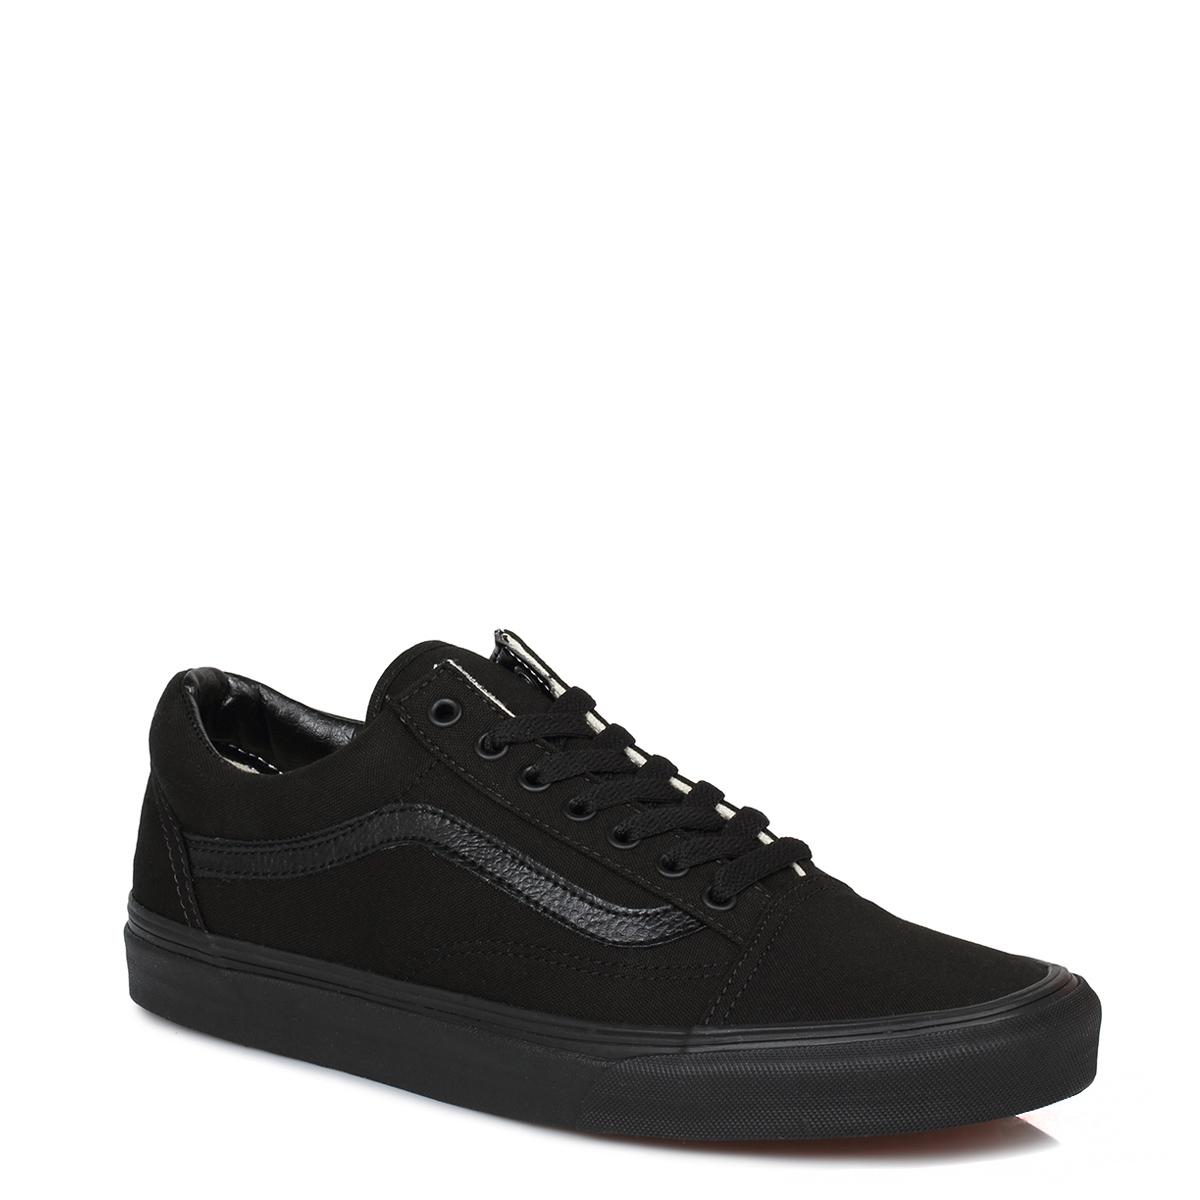 vans mens womens trainers canvas lace up school black